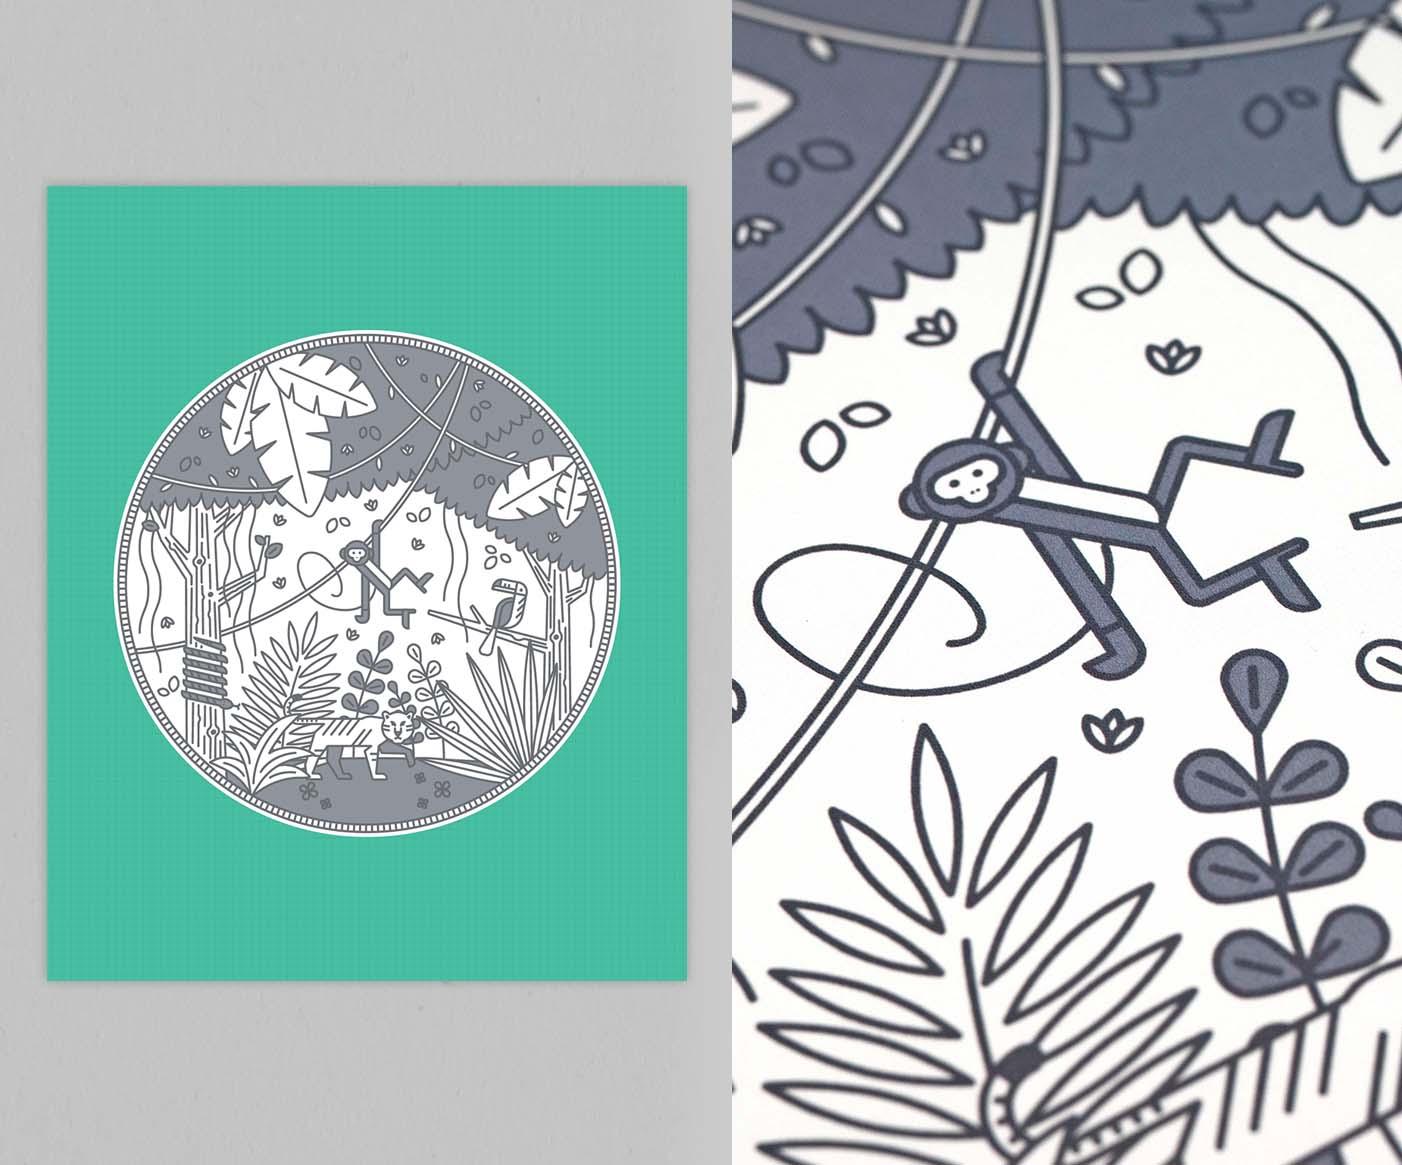 Emily Mullett_World of Illustration-13 B.jpg